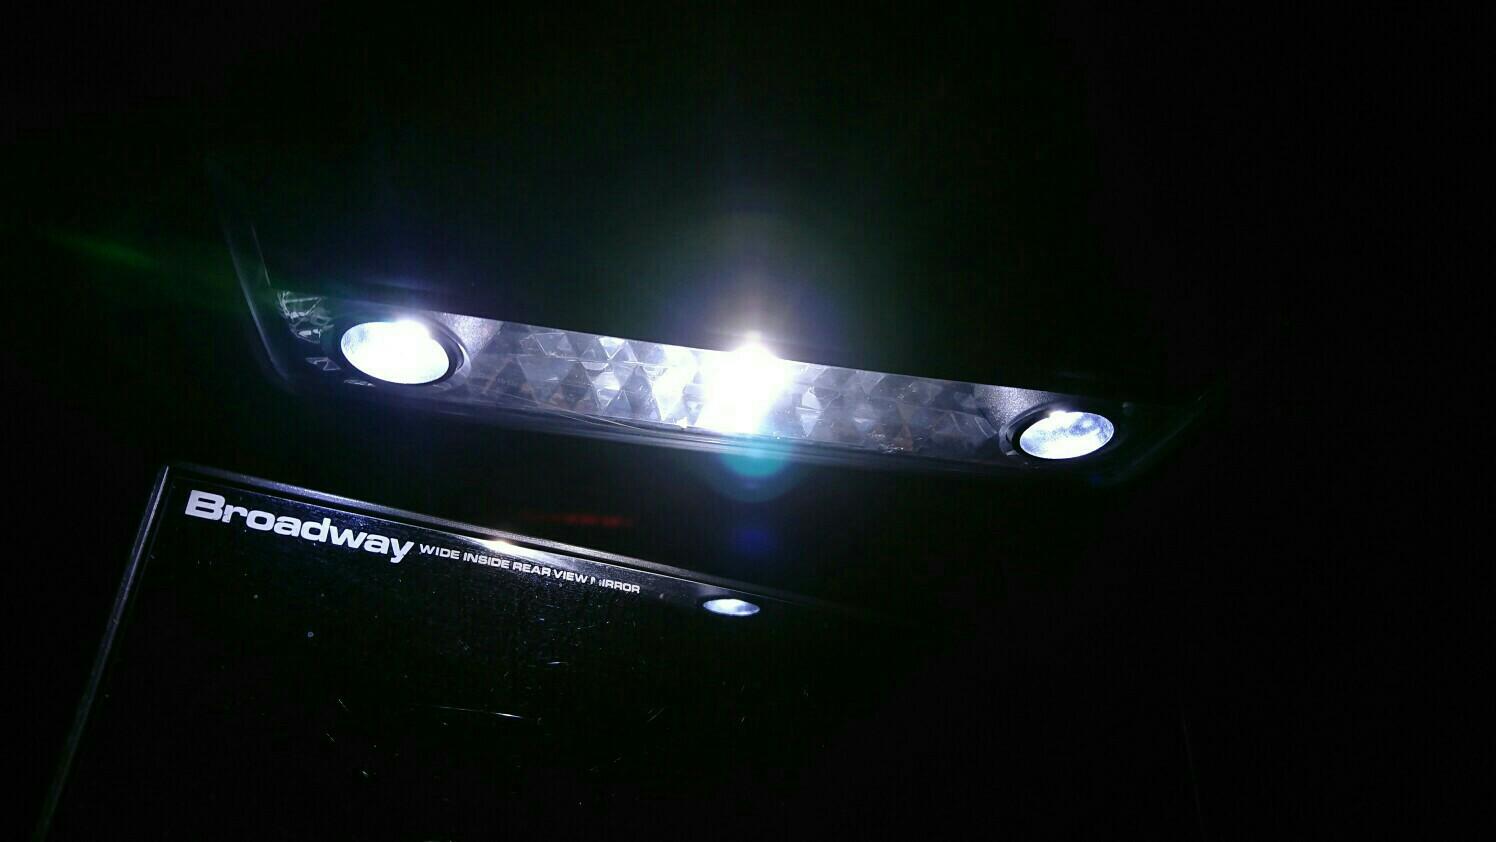 【BMW Z4】ルームランプLED化